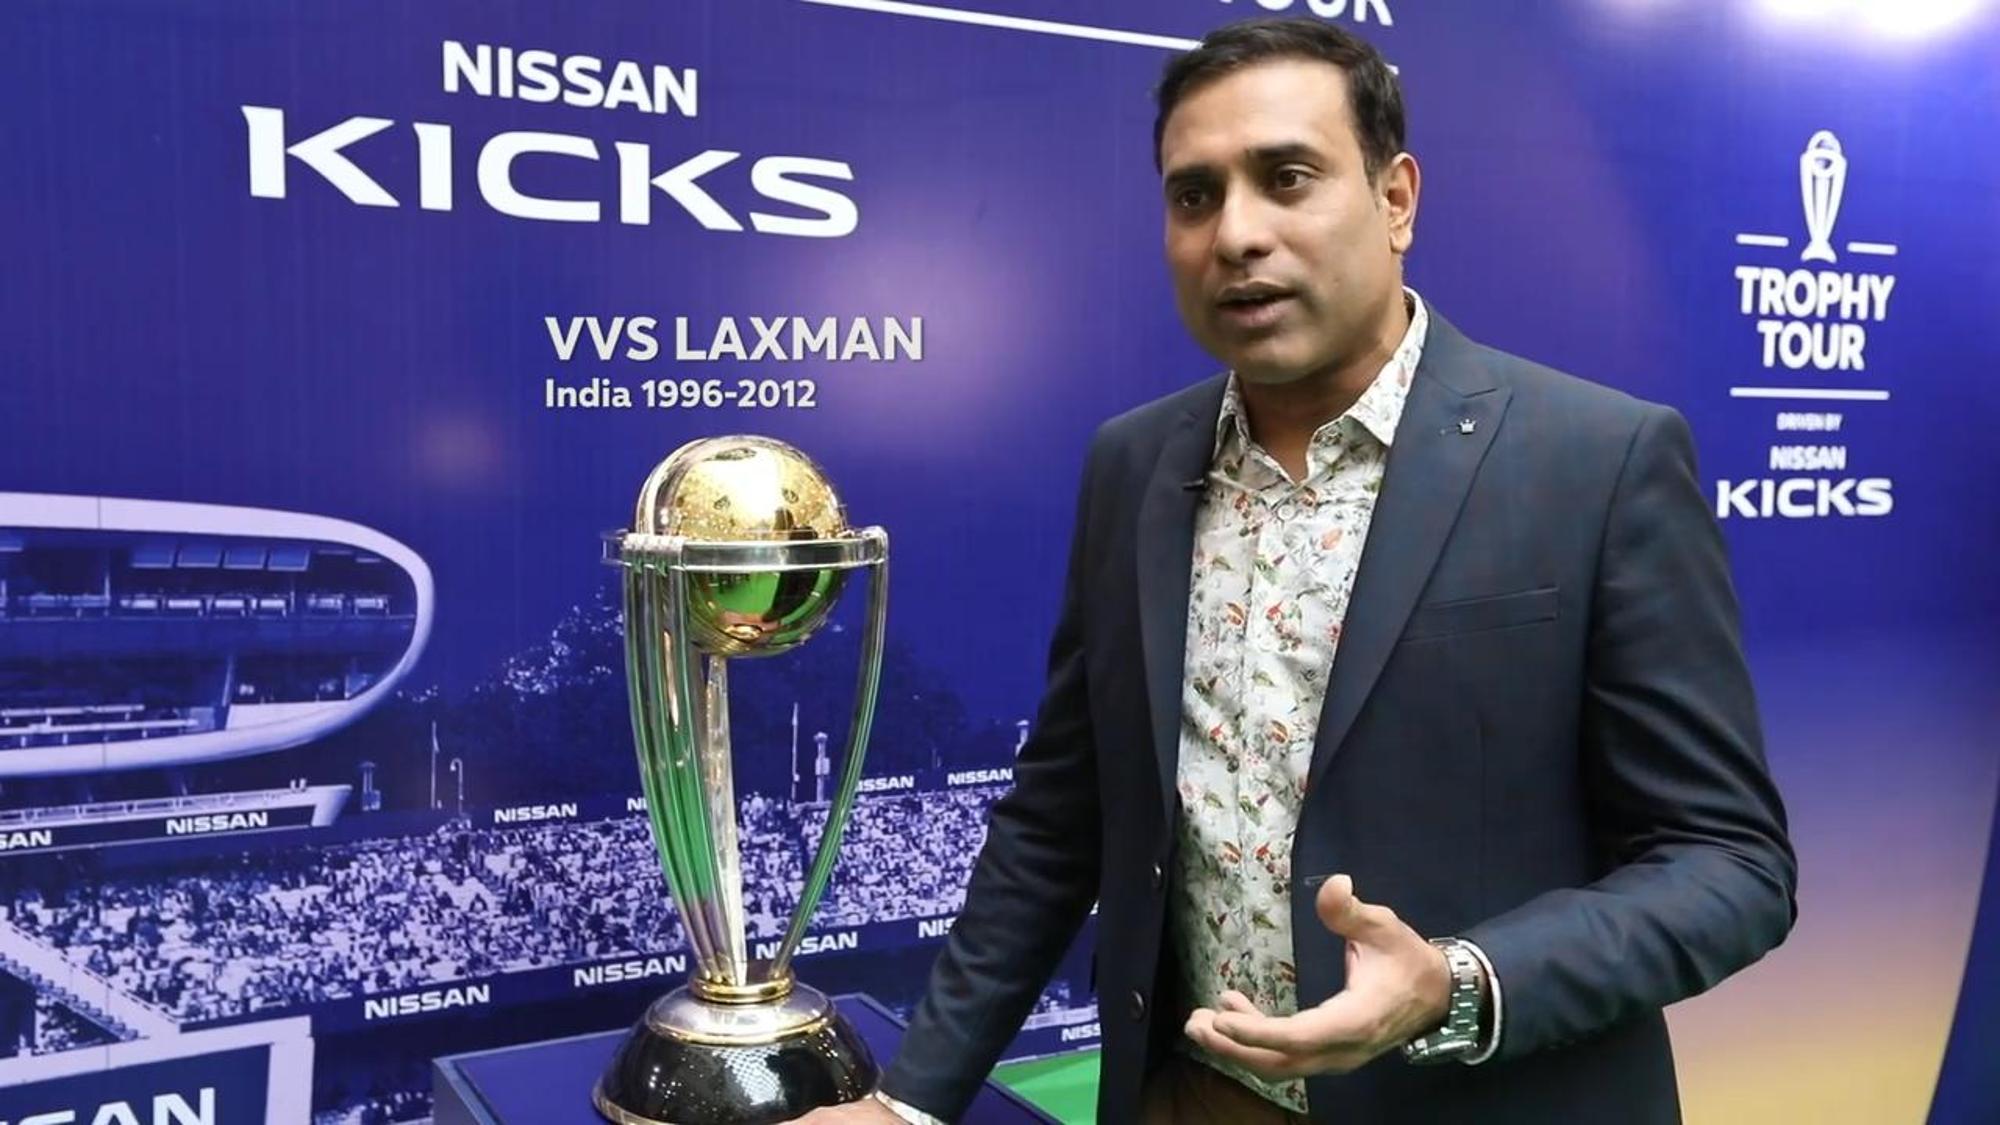 Laxman joins ICC CWC Trophy Tour driven by Nissan Kicks in Delhi